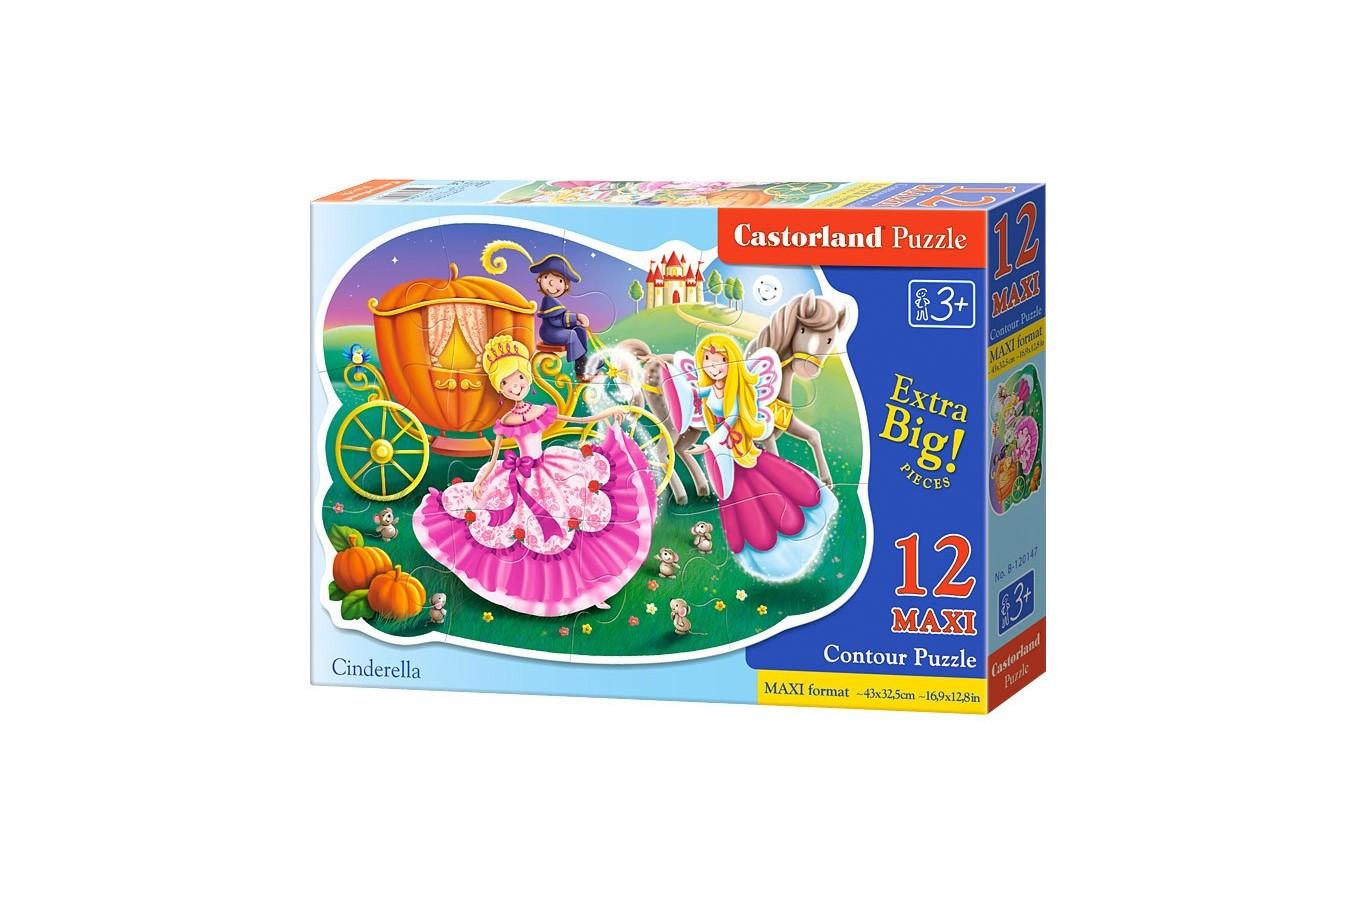 Puzzle Castorland Maxi - Cinderella, 12 Piese